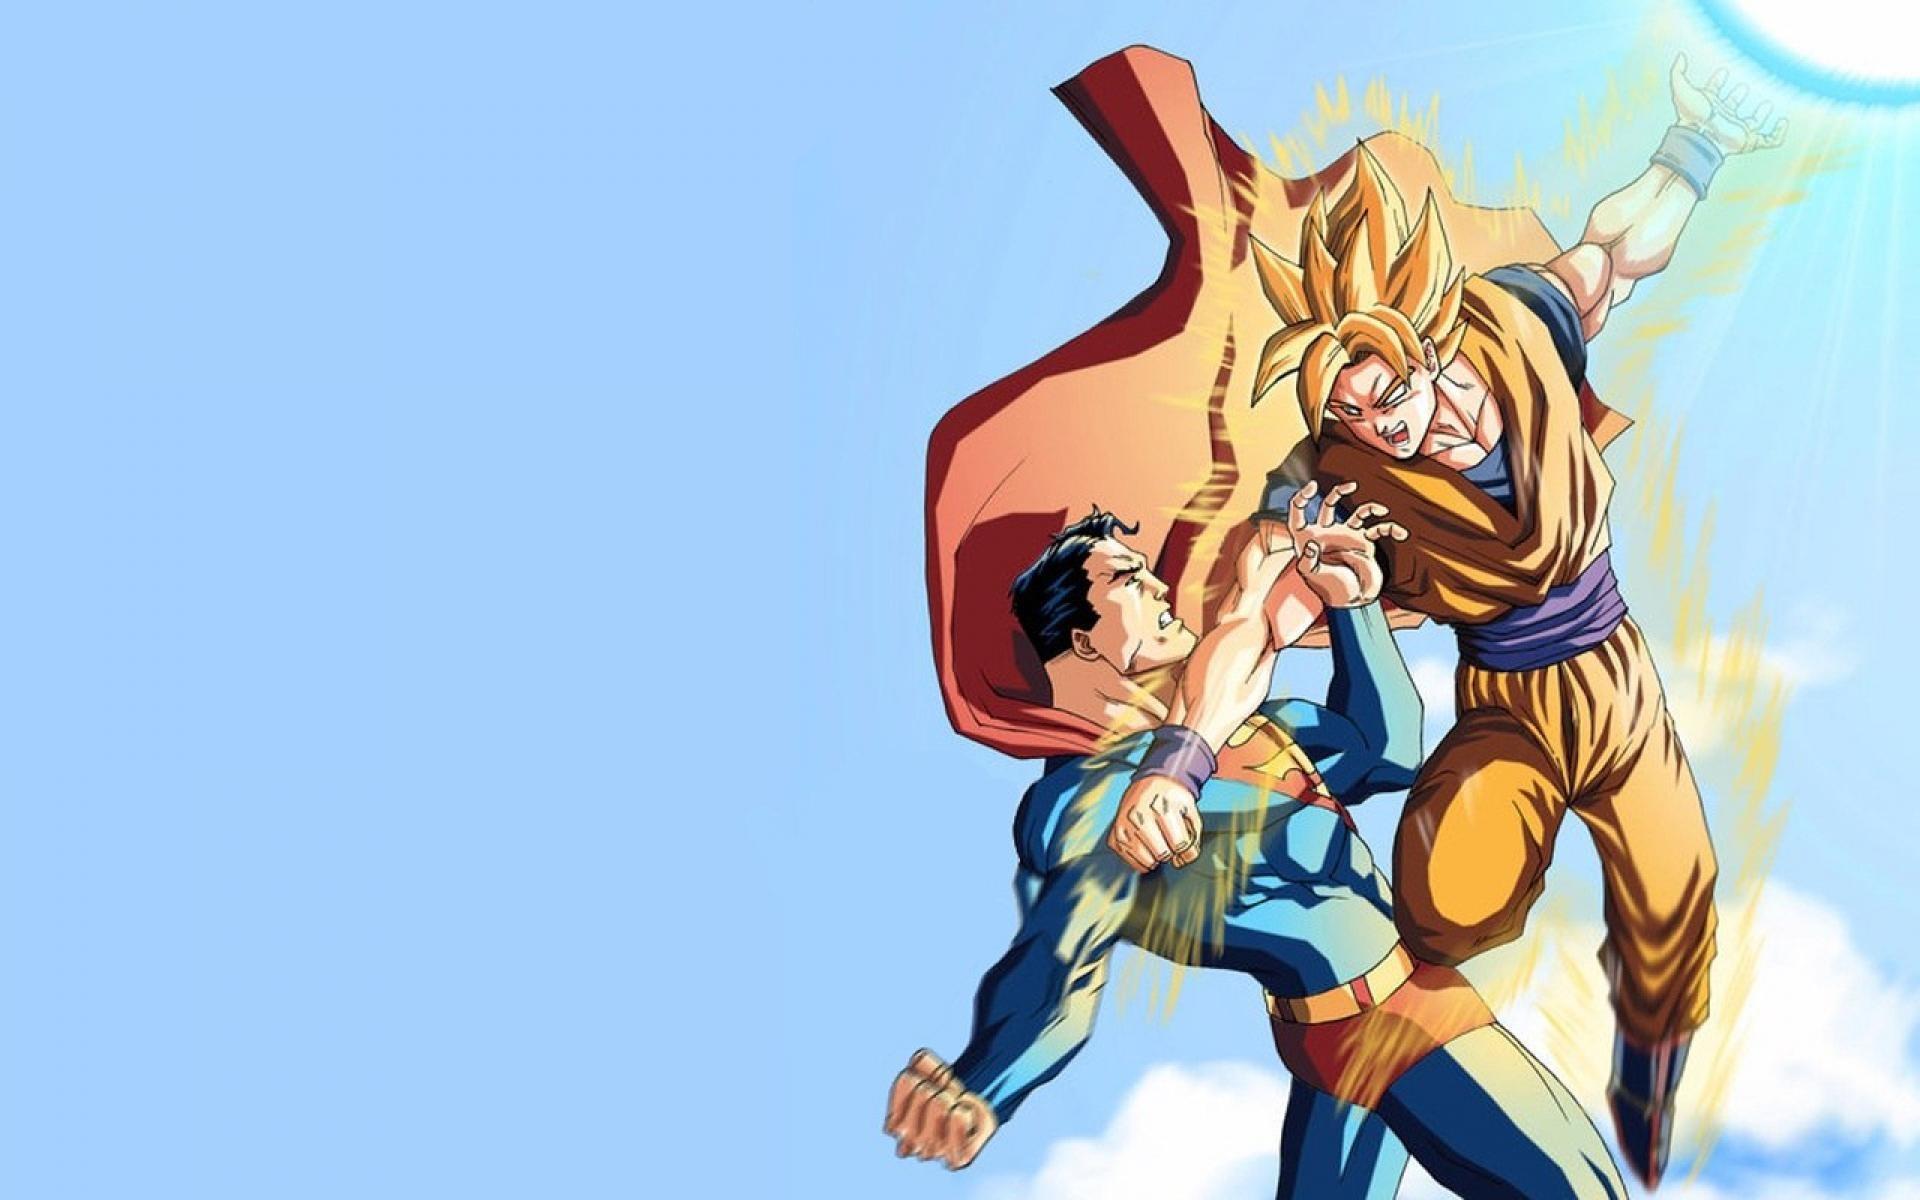 Son Goku Super Saiyan Vs Superman Wallpaper #4708 | Frenzia.